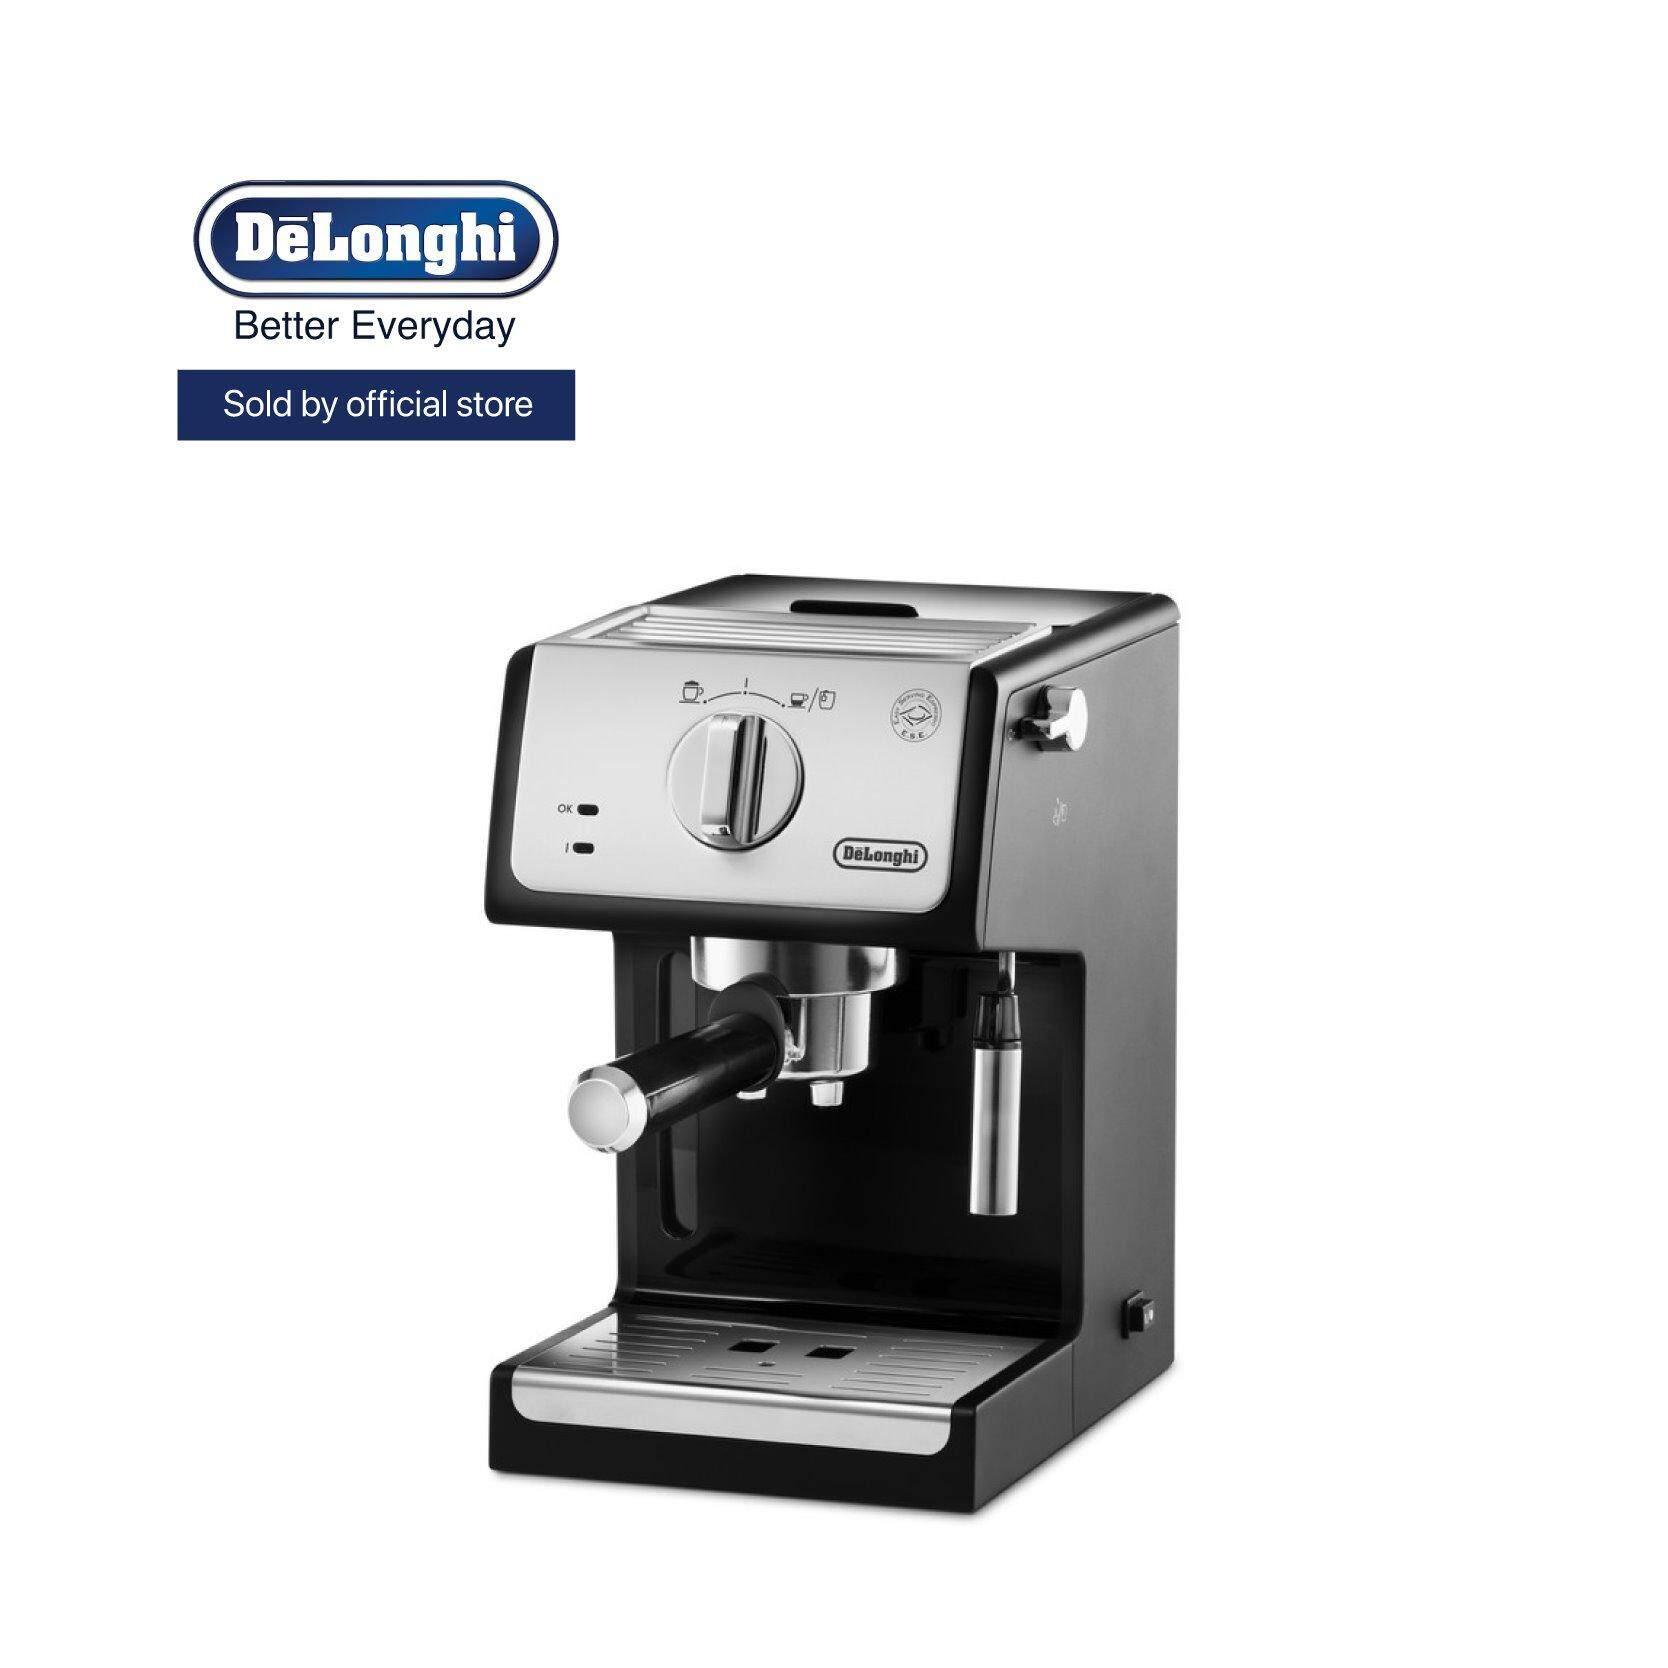 Coffee Maker Electrolux 1 5 Liter Ecm3505 Daftar Harga Terkini Dan Worcas Premium Syphon Tca 600ml